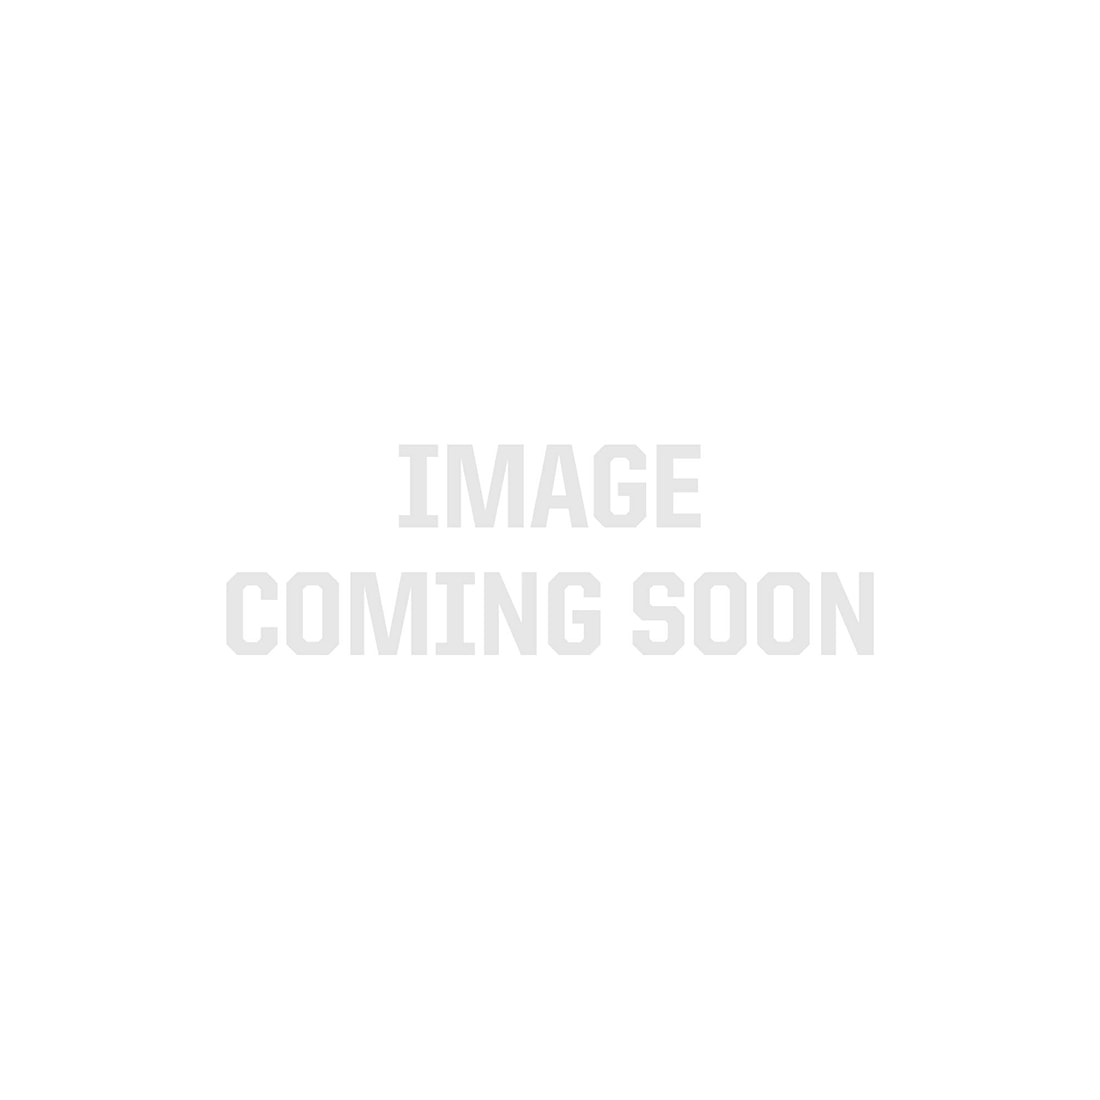 Pink 3528 Single Row LED Strip Light, 120/m, 10mm wide, Sample Kit